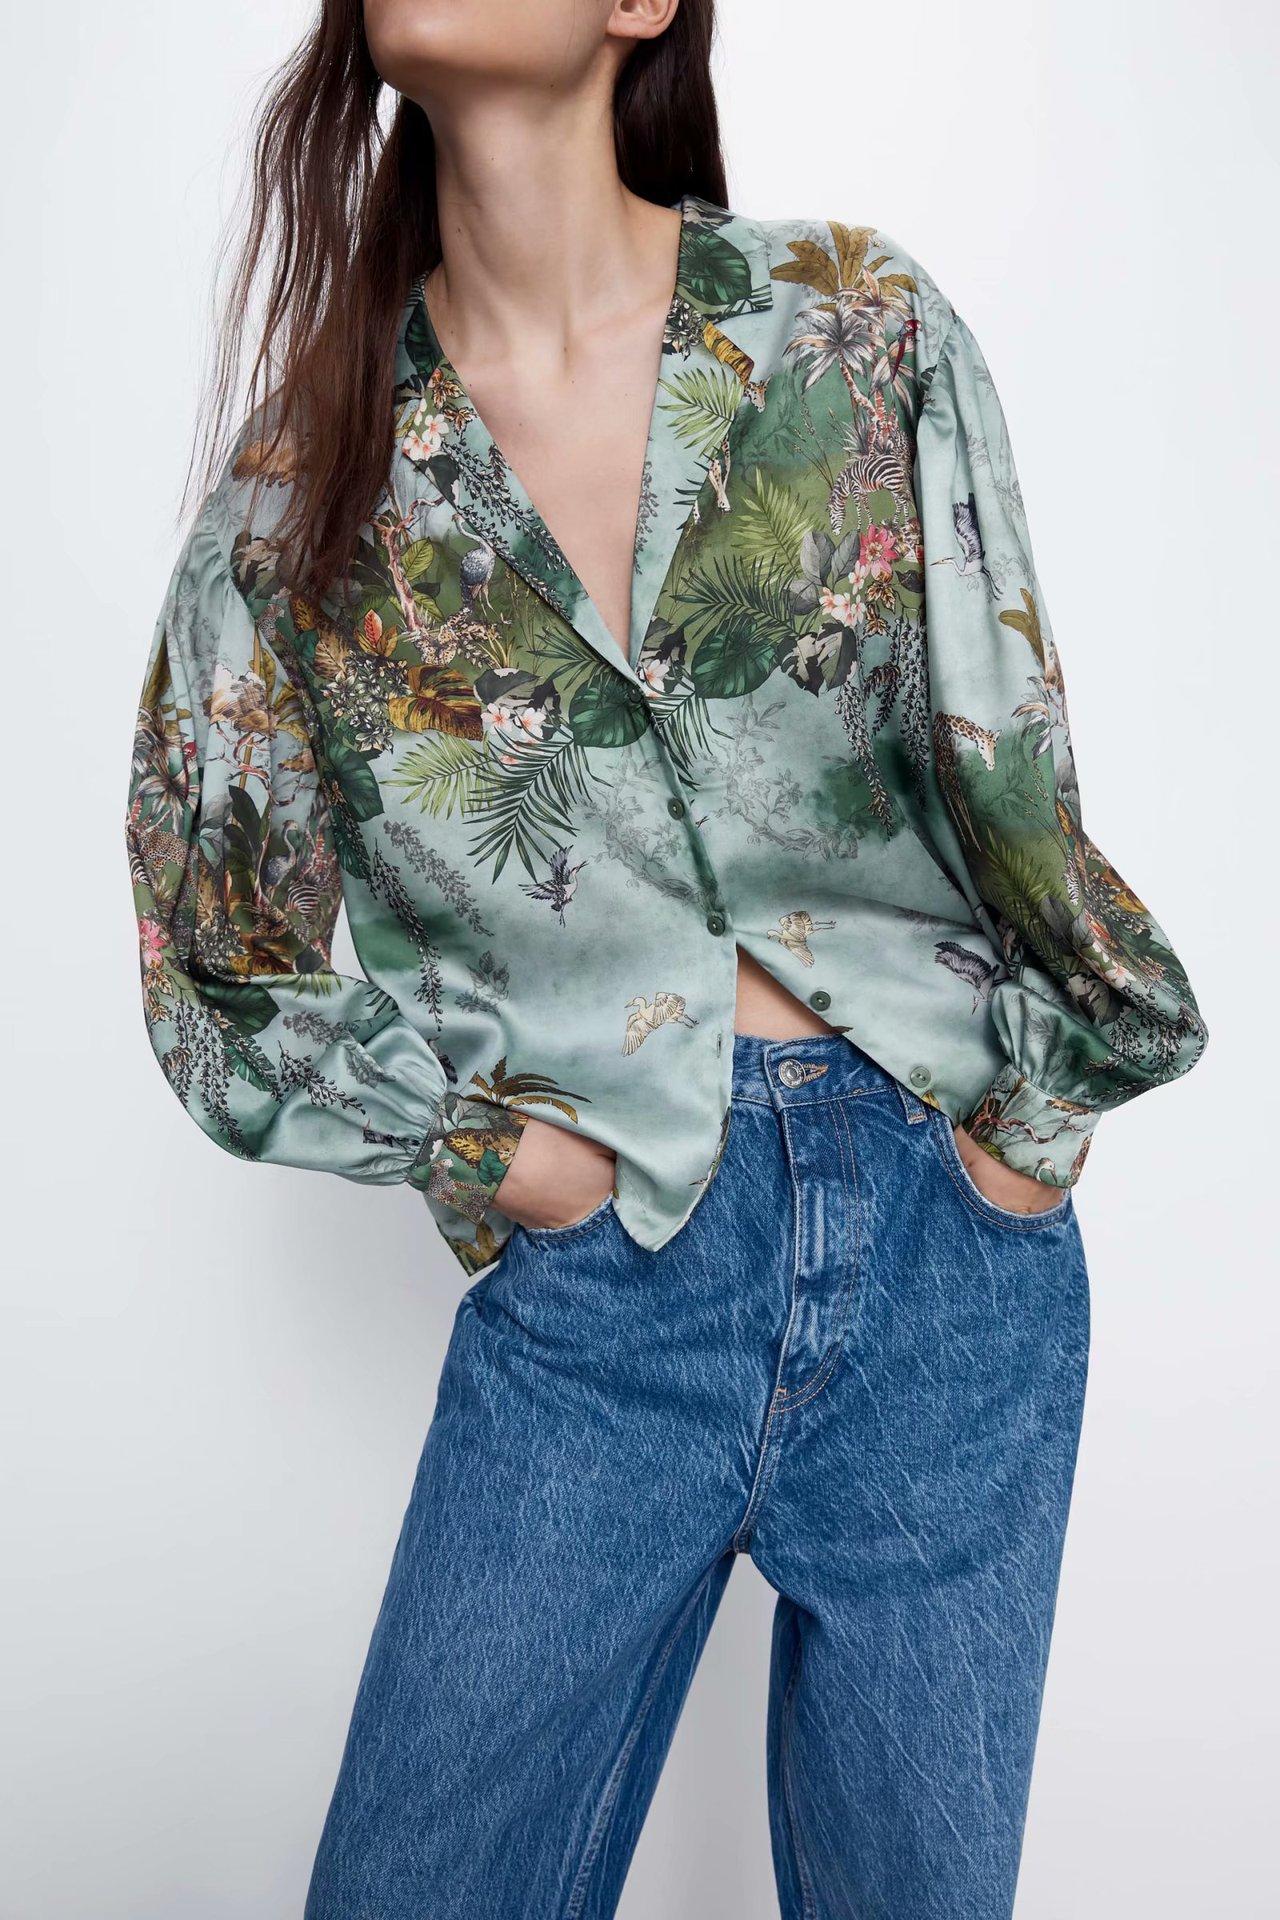 2020 Spring And Summer New Style European Printed Flowing Shirt Zaraing Vadiming Sheining Women's Shirt